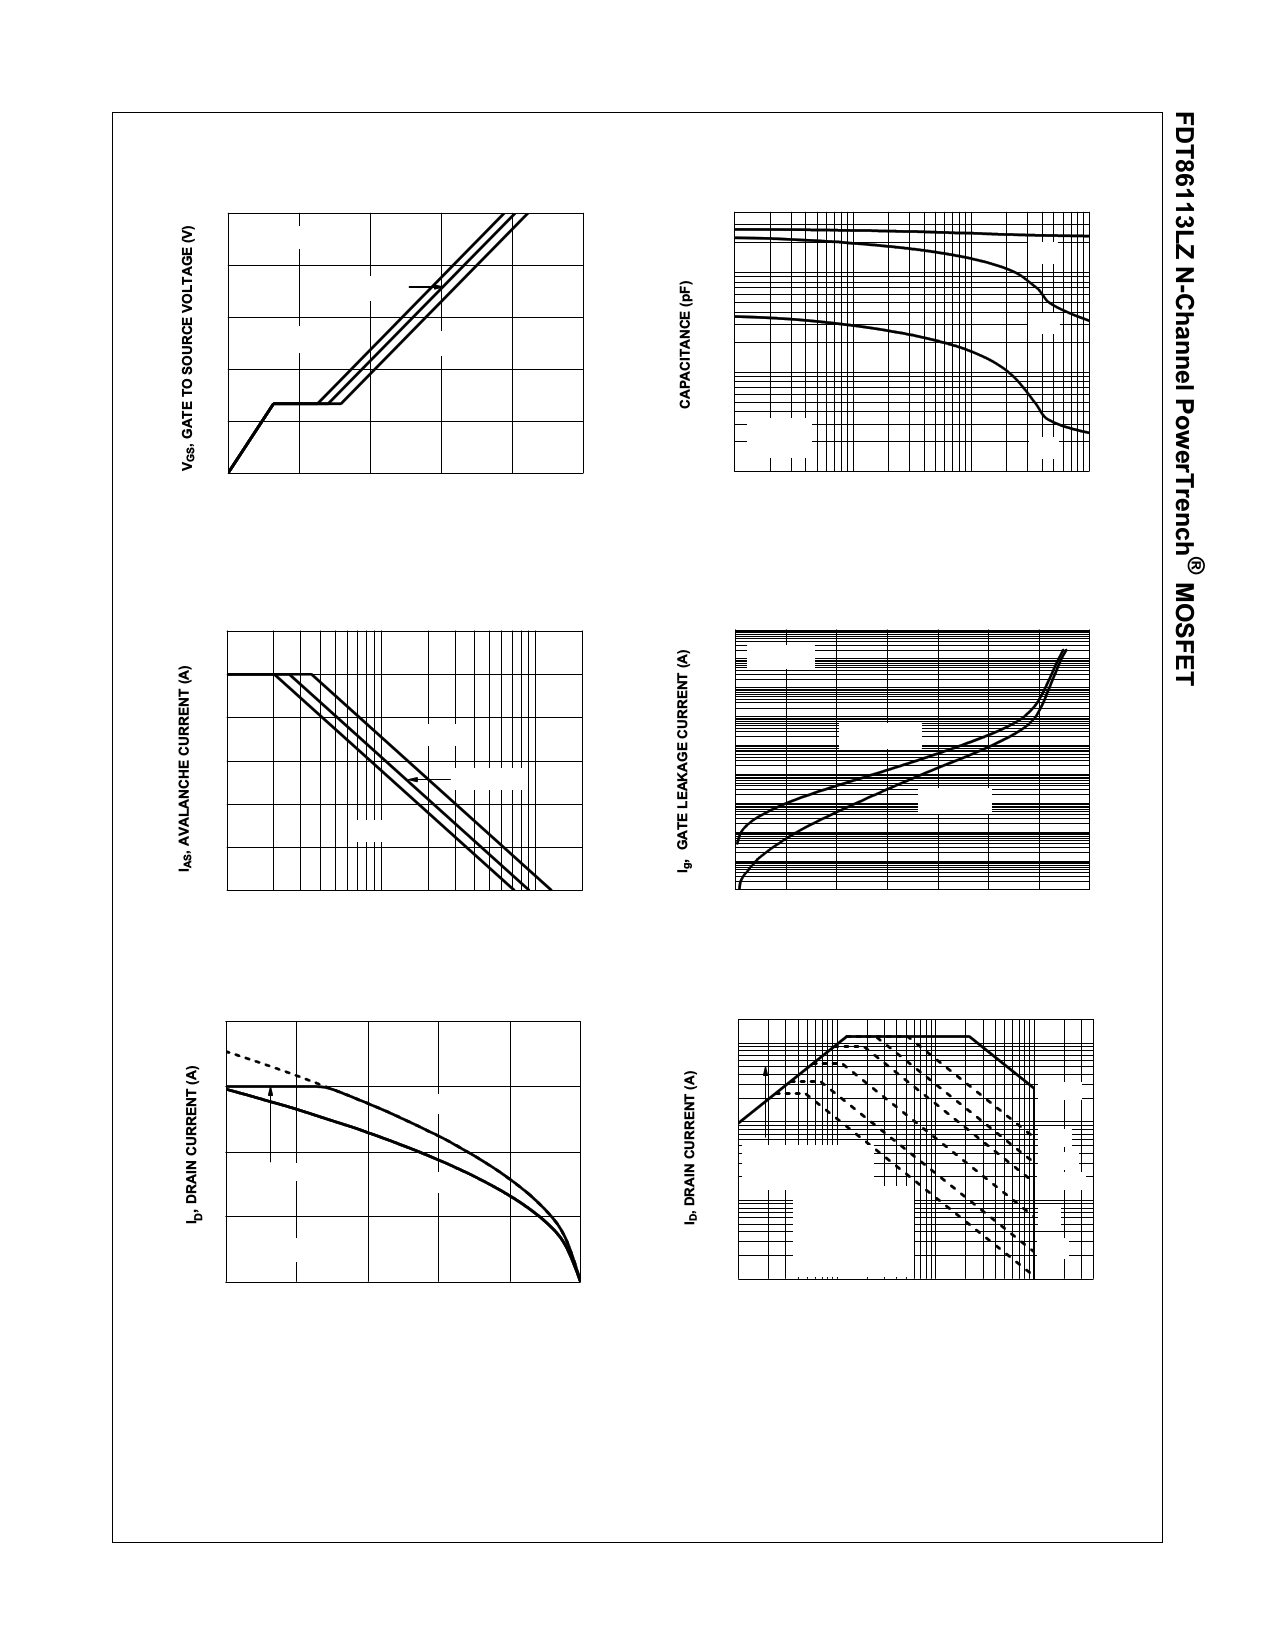 FDT86113LZ pdf, 반도체, 판매, 대치품